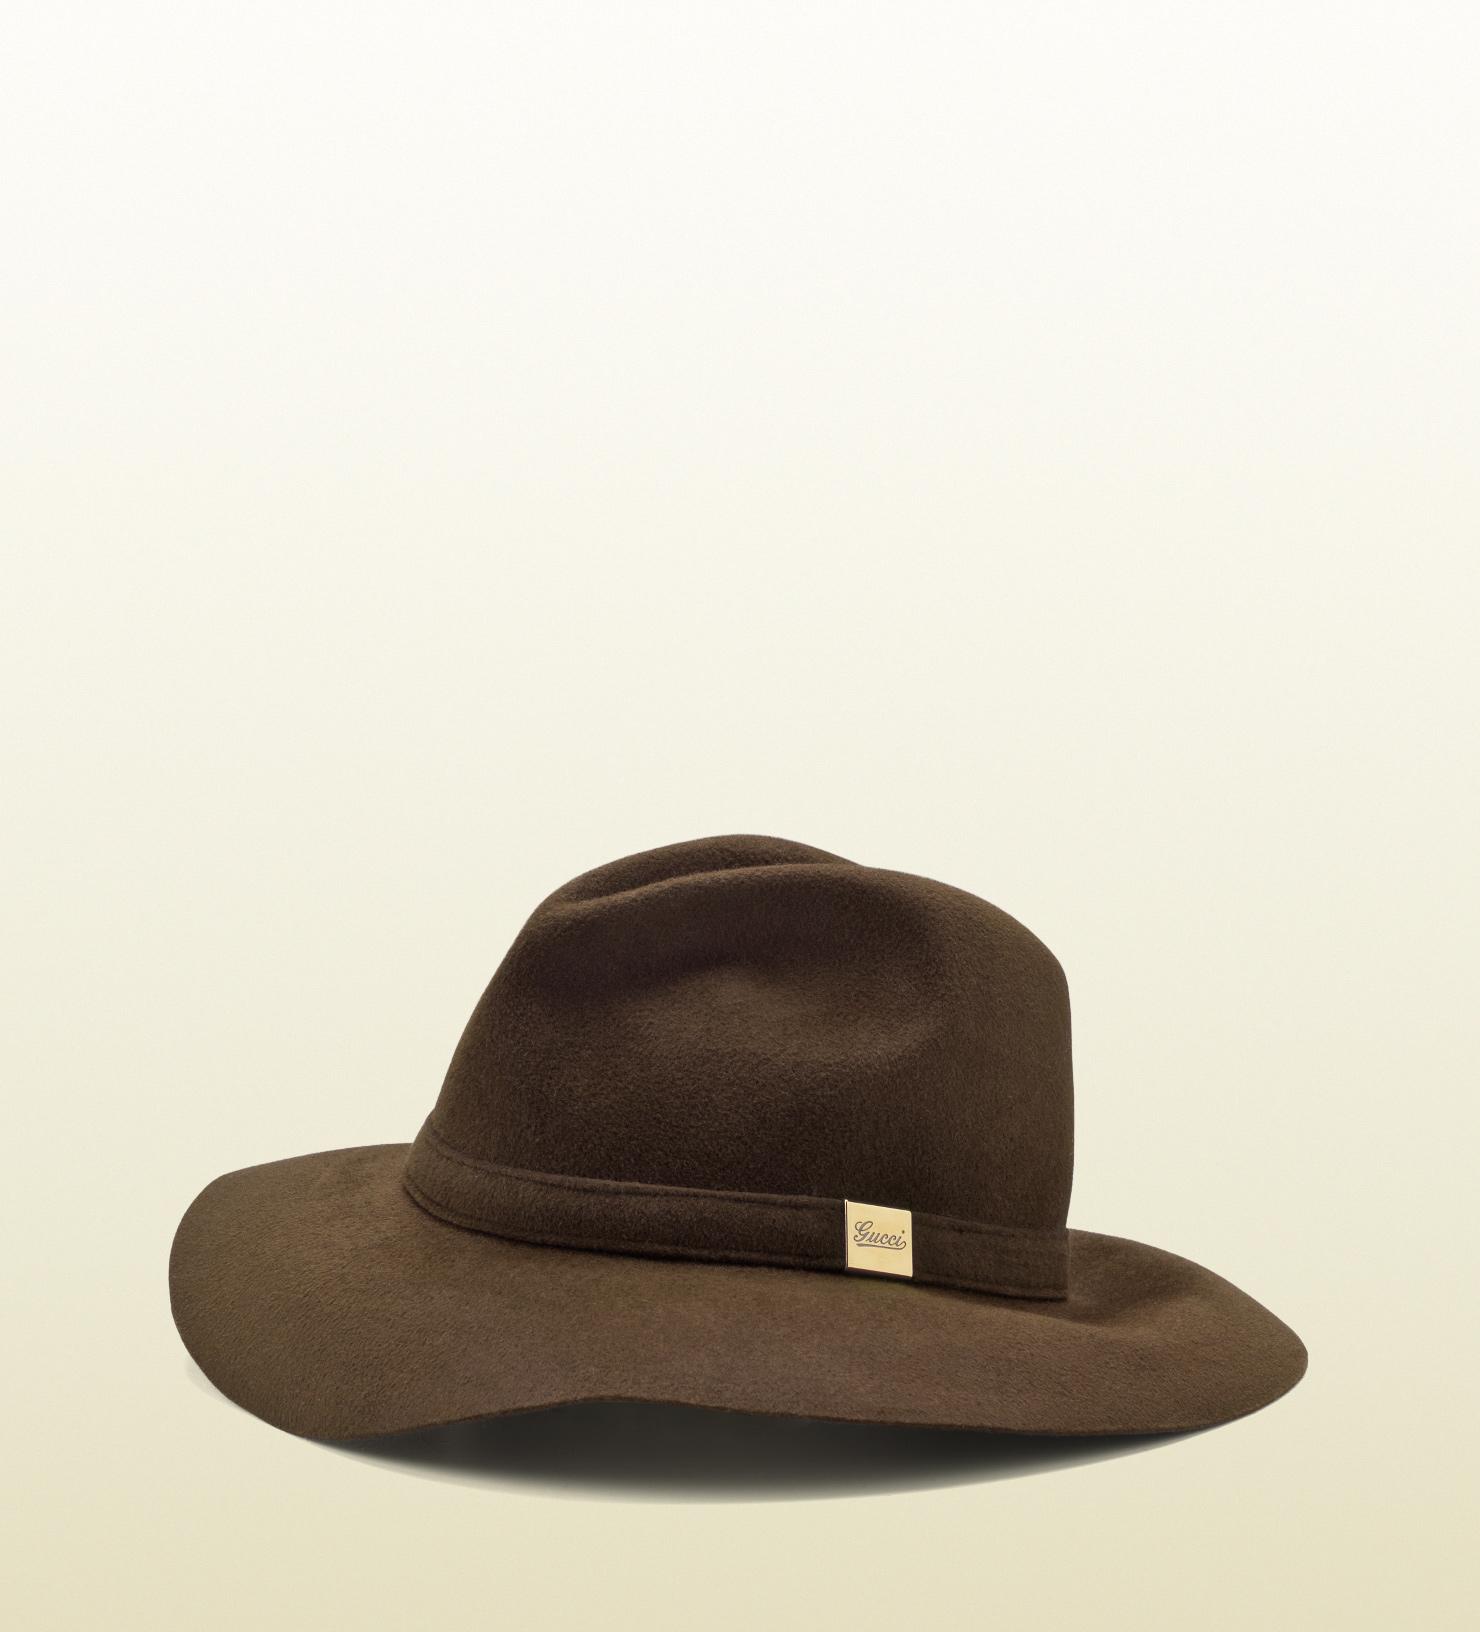 ffb3b2b85c6 Lyst - Gucci Trilby Hat with Engraved Gucci Script Logo in Brown